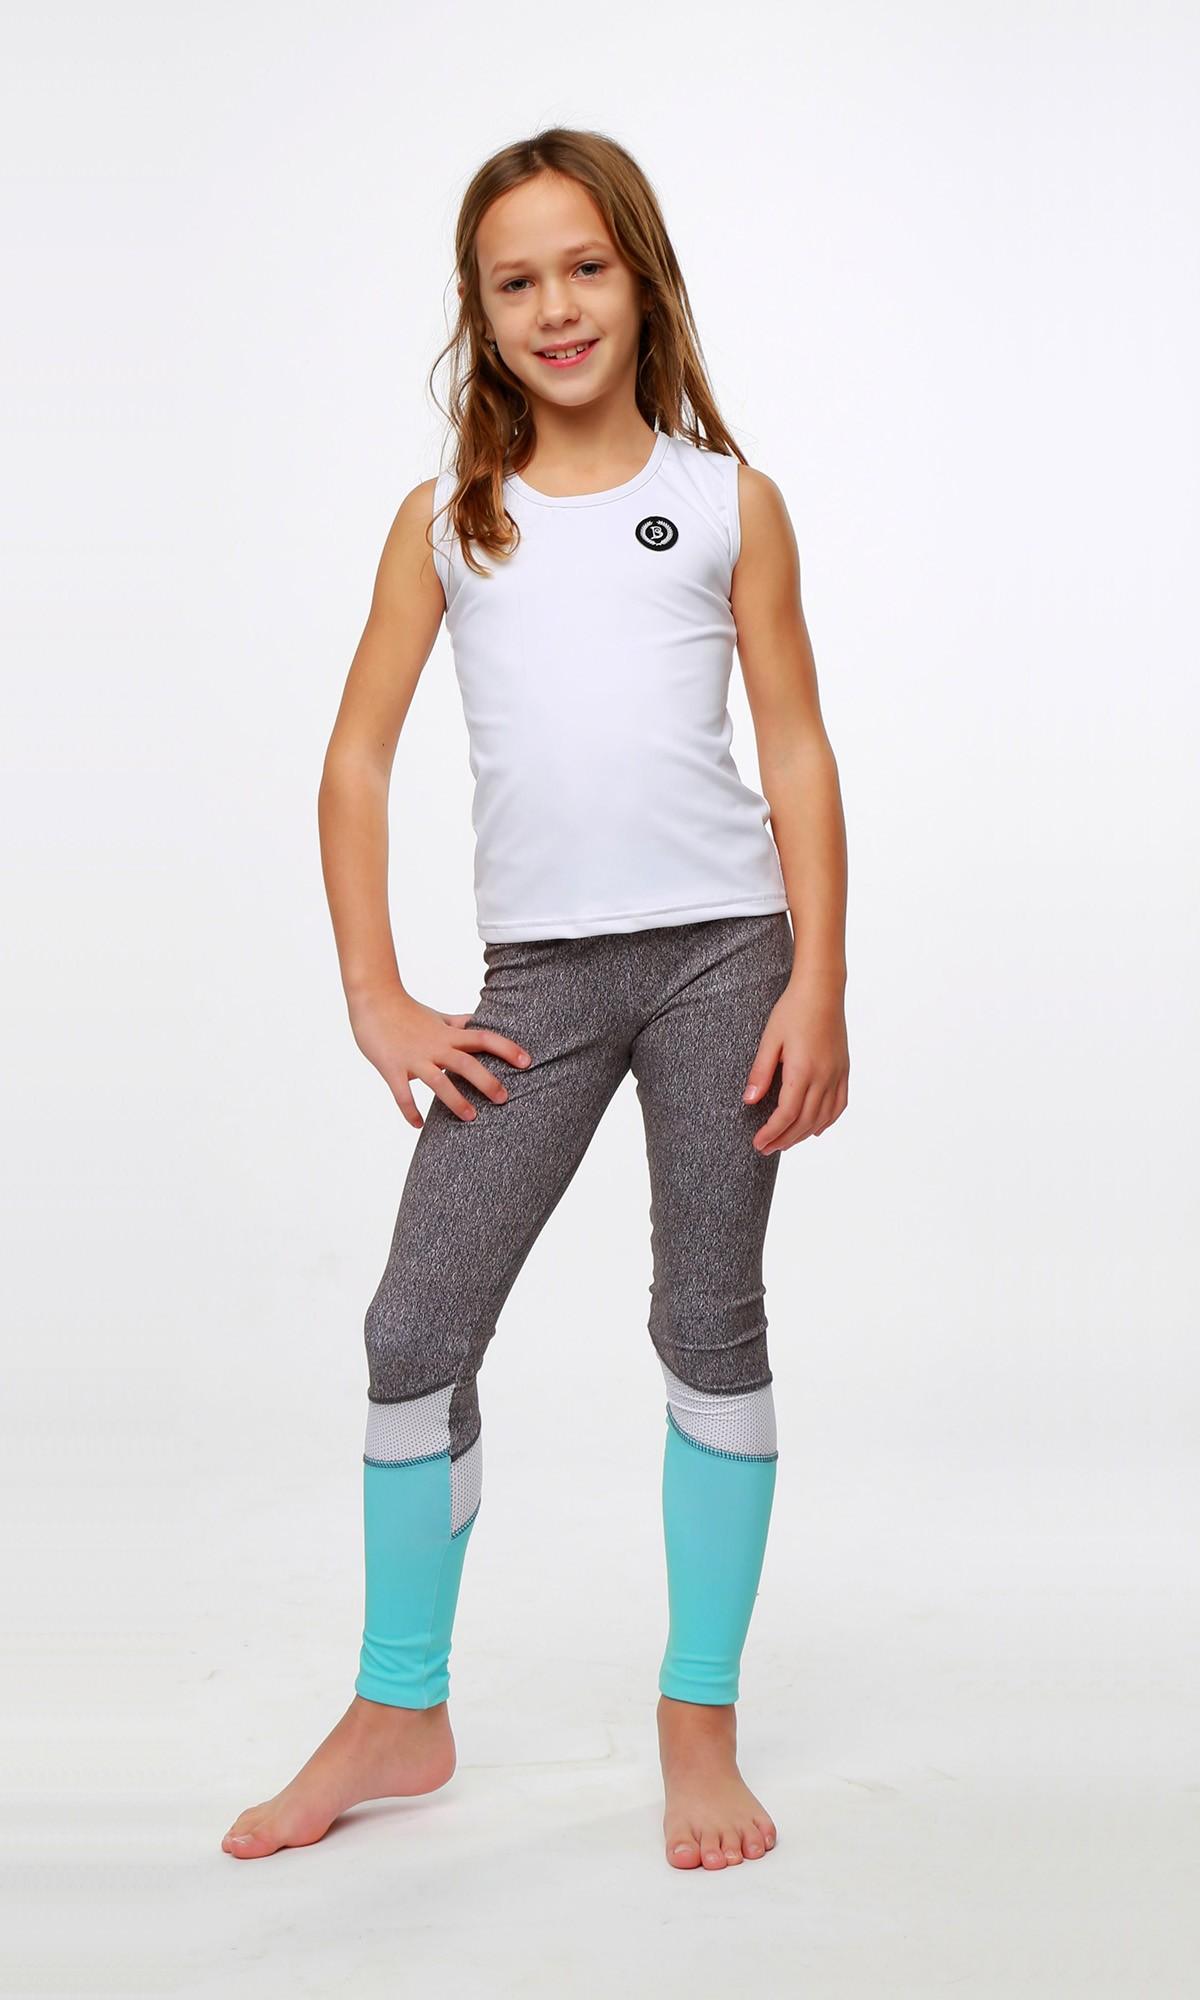 Tanfolyamok / Maeril Blue gyerek fitness nadrág